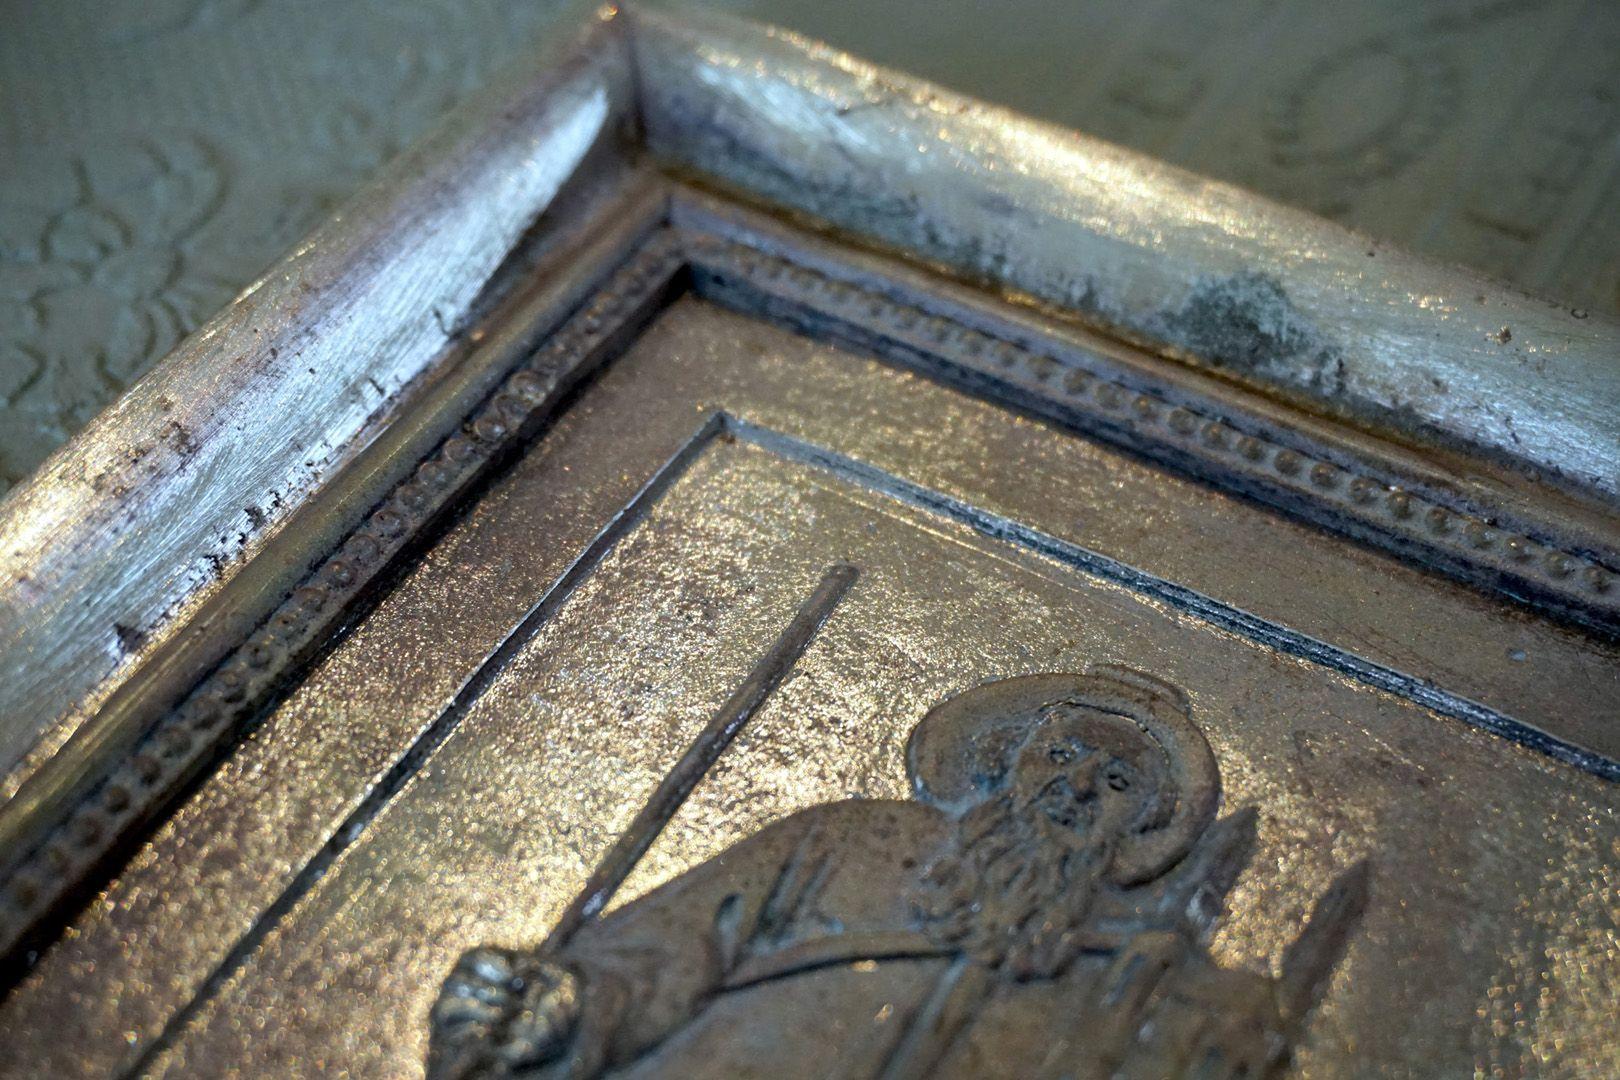 Paul Ritter Grabstätte Bronzeguß noch unbehandelt, Detail des Reliefs von Sankt Sebald